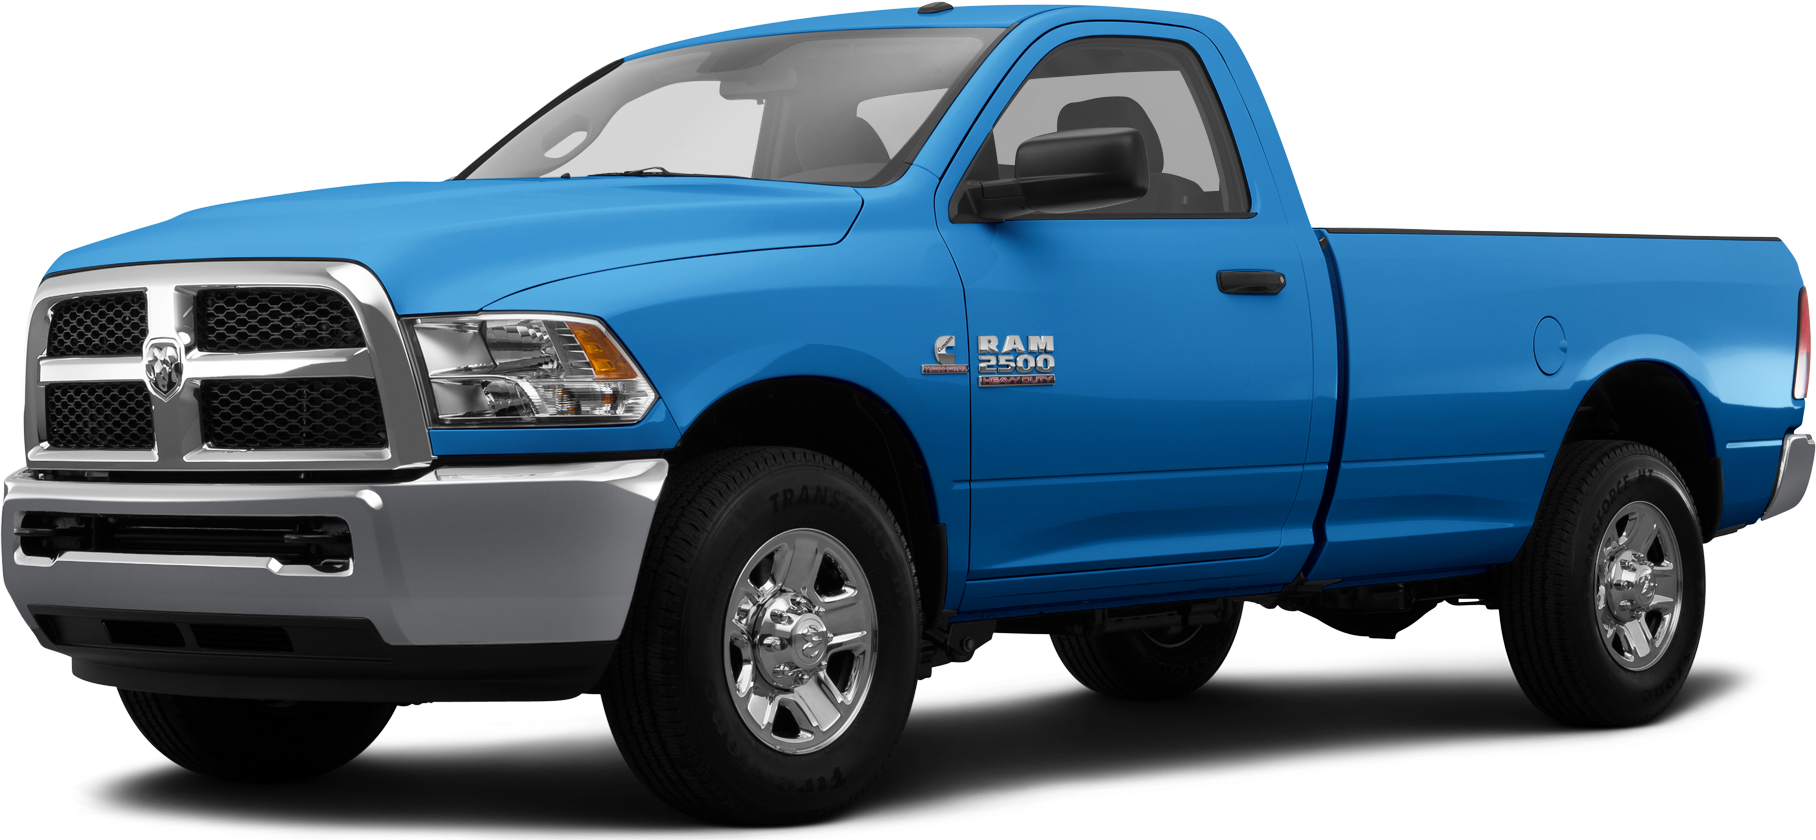 2014 Ram 1500 Crew Cab | Pricing, Ratings, Expert Review